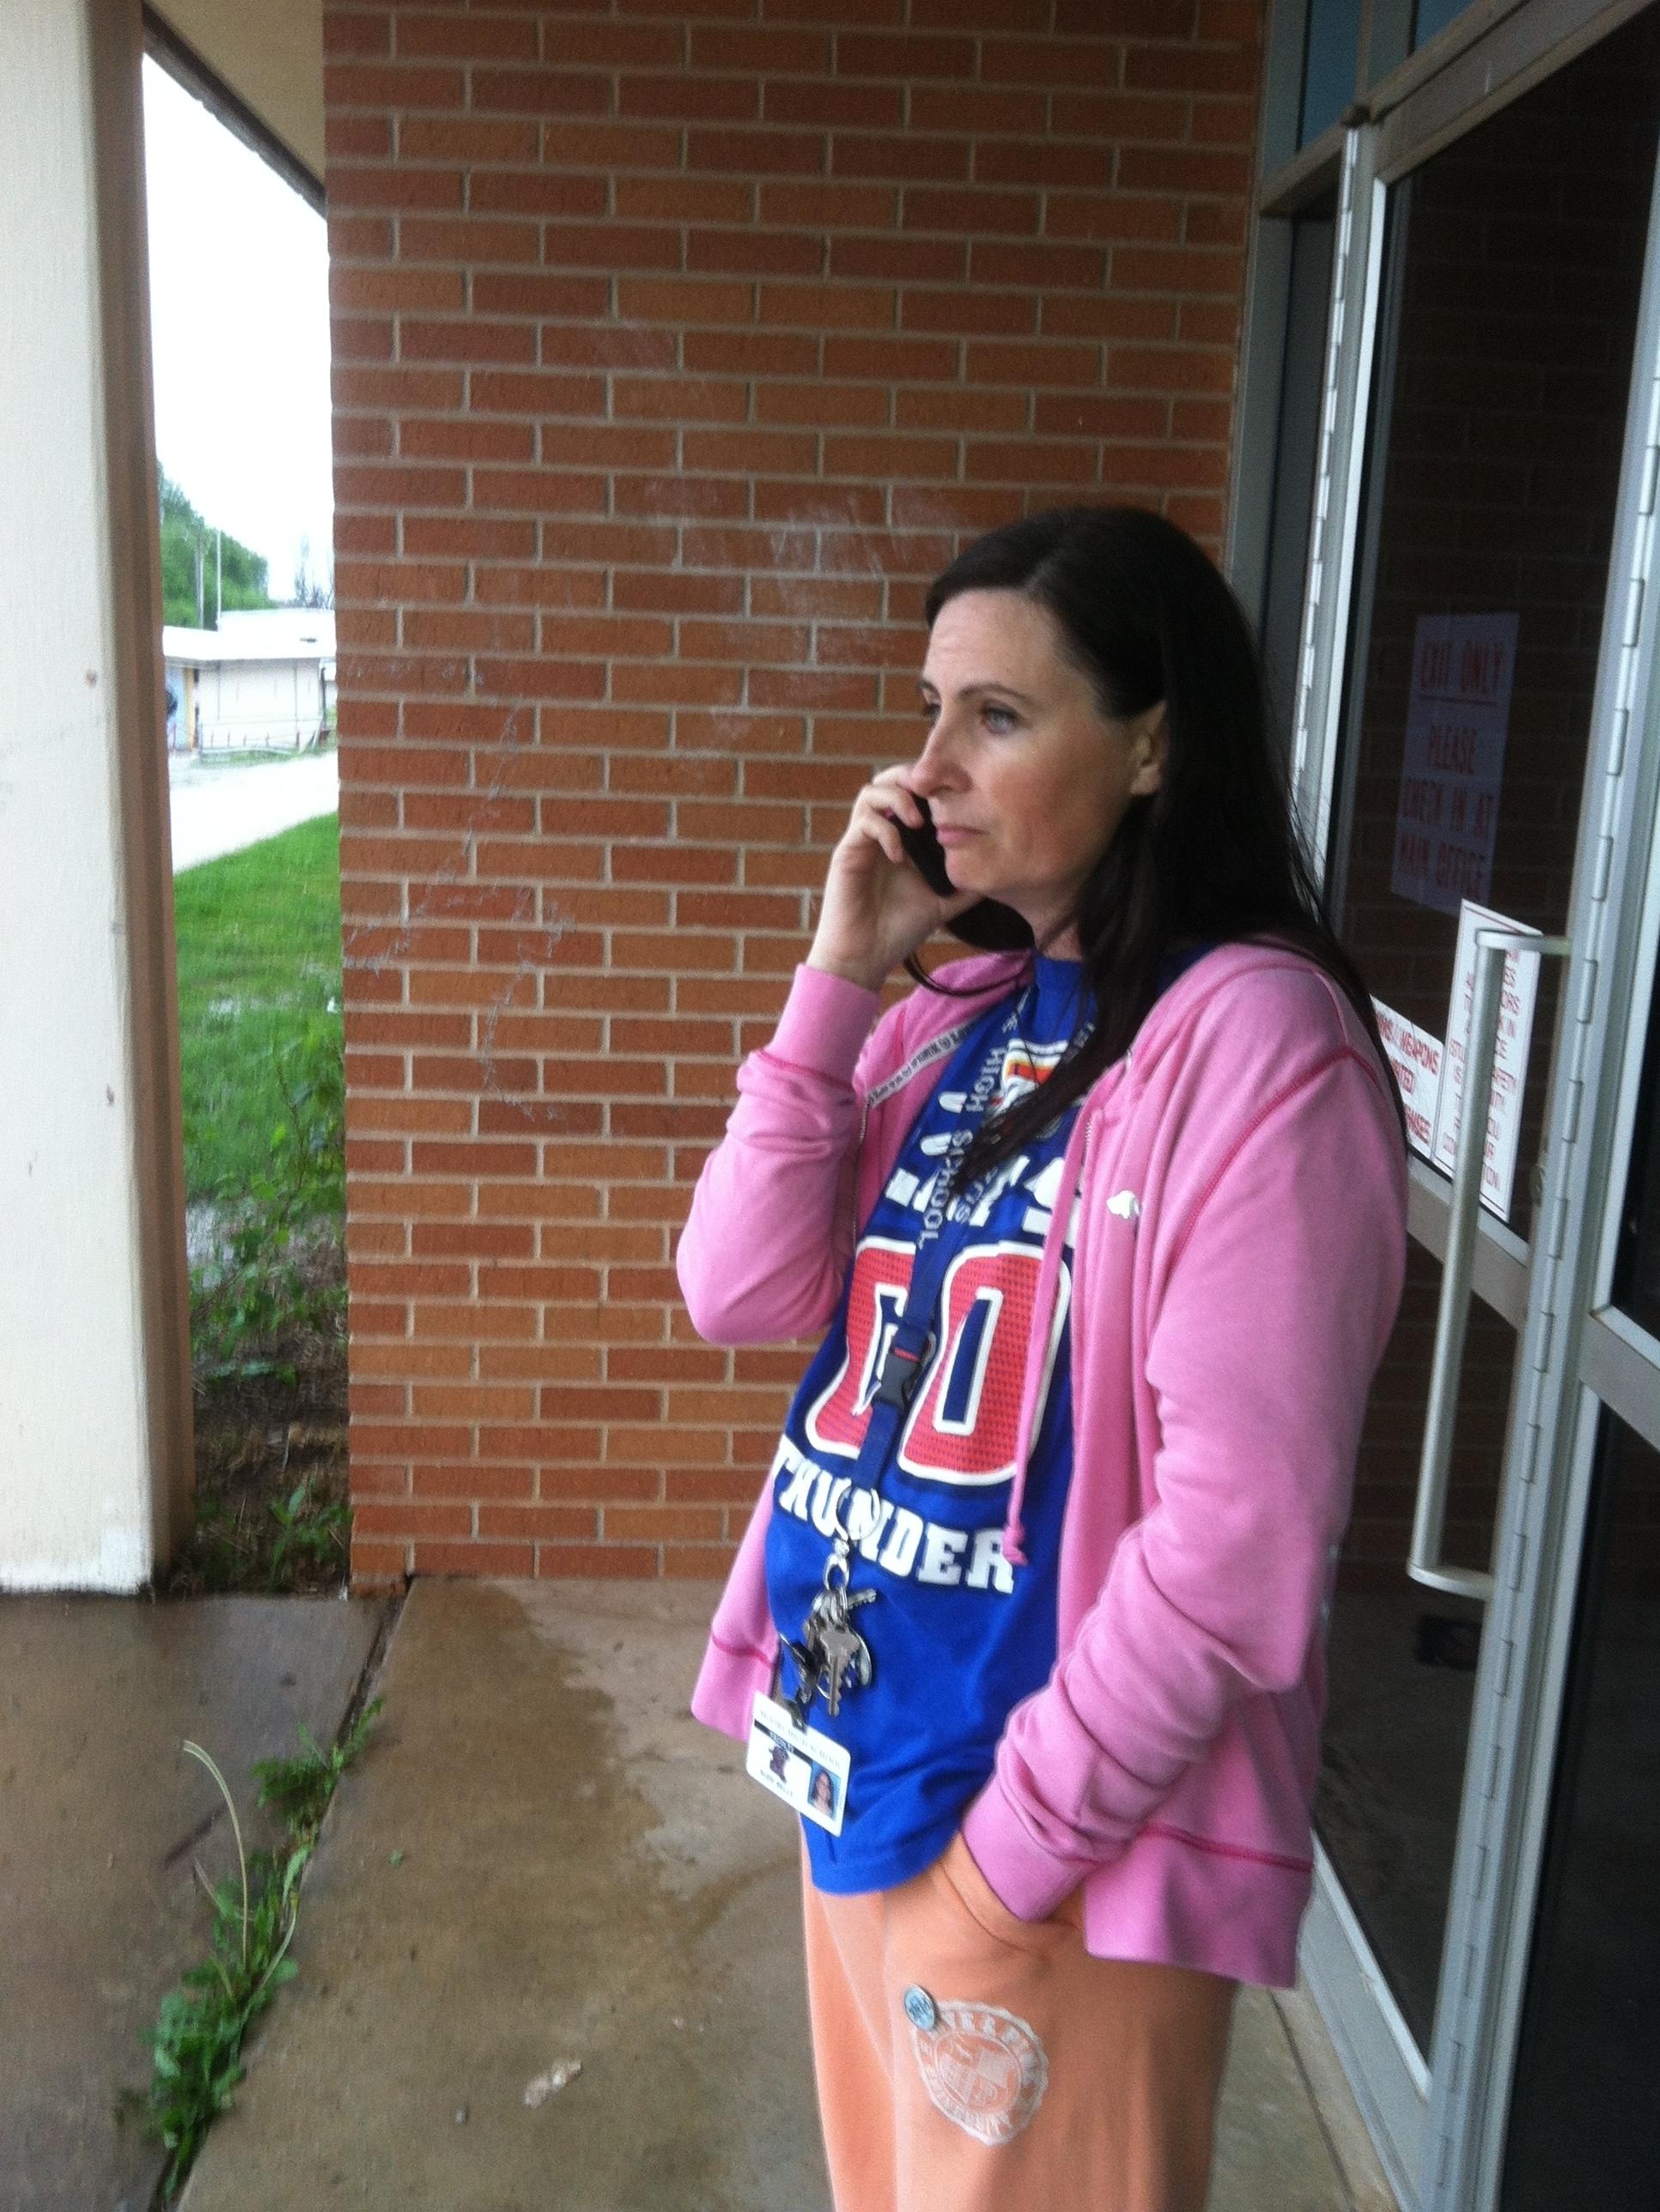 Teacher Led Students Through Storm Despite Peril To Daughter